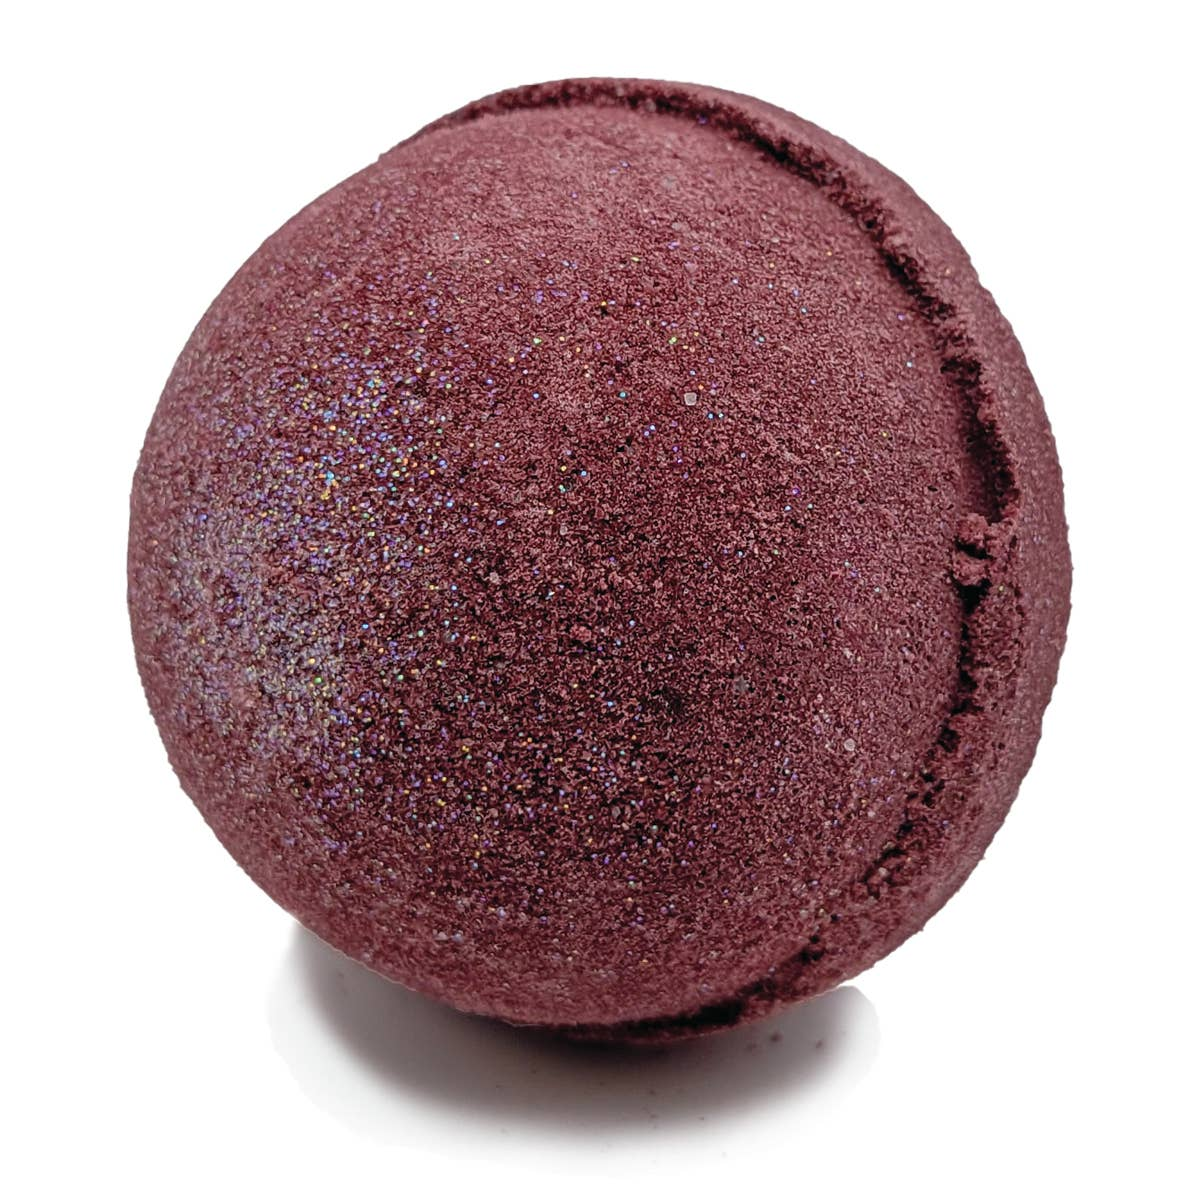 Evolve - Bath Bomb - Chakra Collection - Jasper | Trada Marketplace